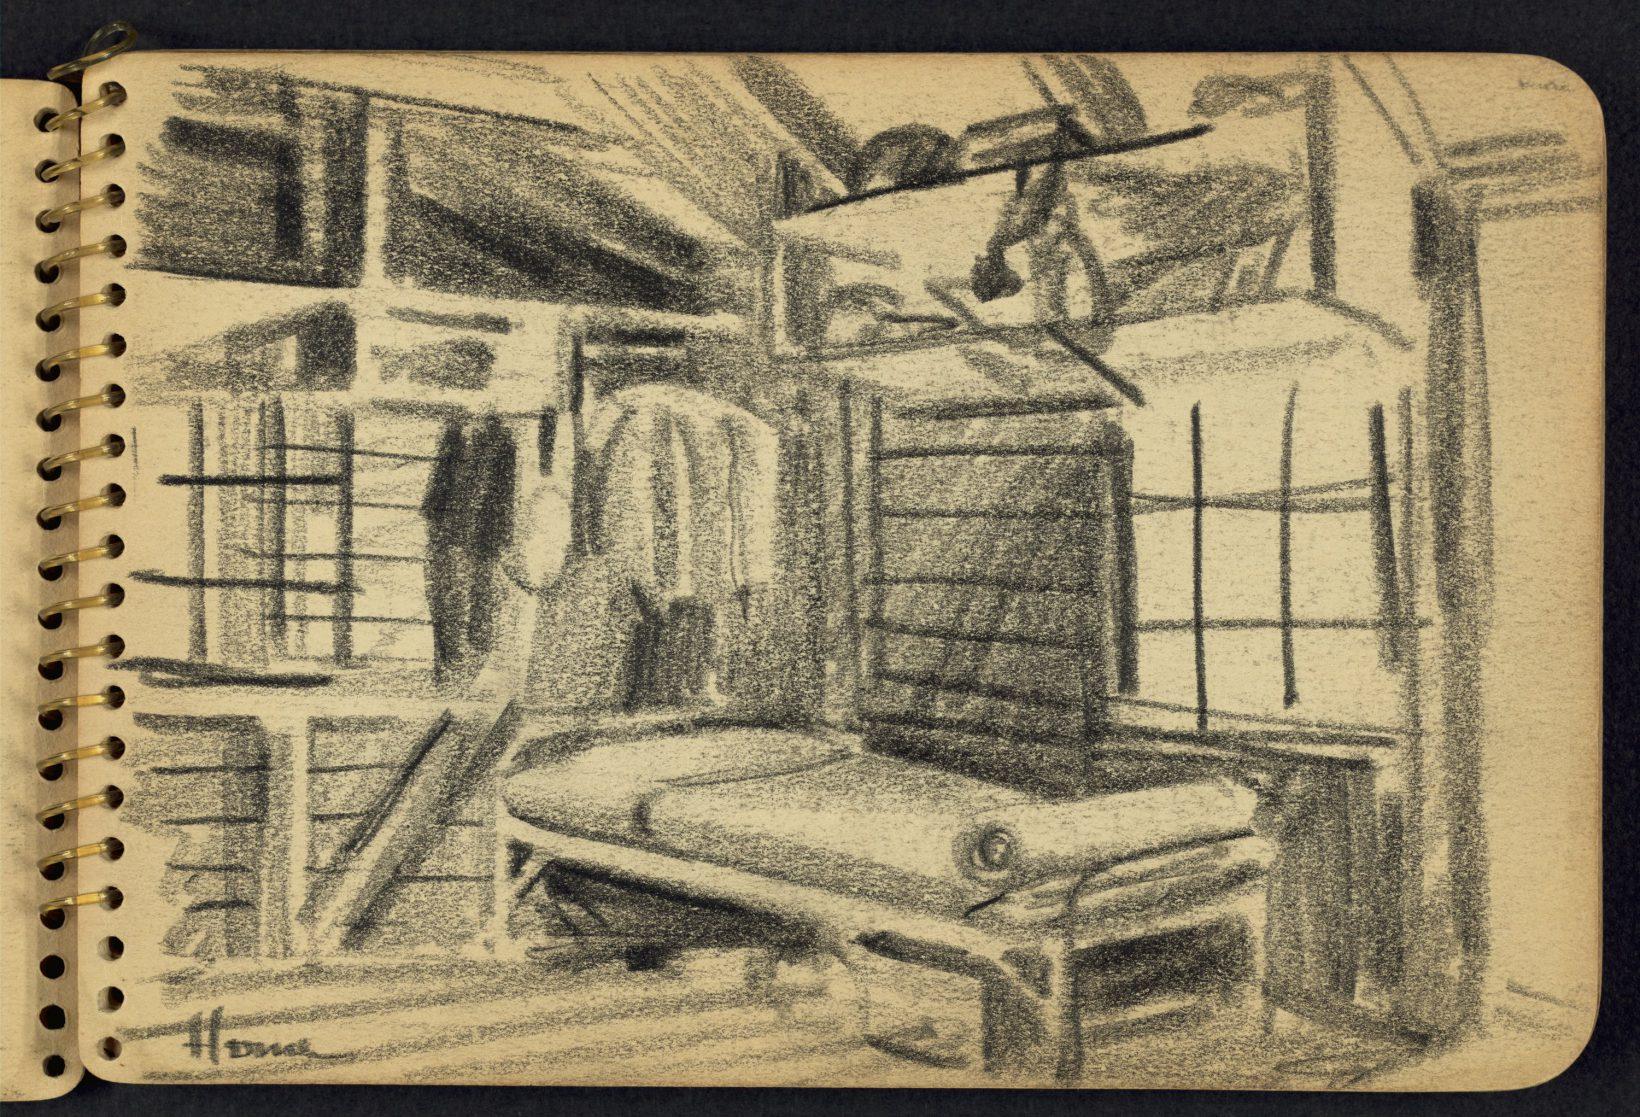 victor-lundy-carnet-croquis-seconde-guerre-mondiale-03-1640x1117.jpg